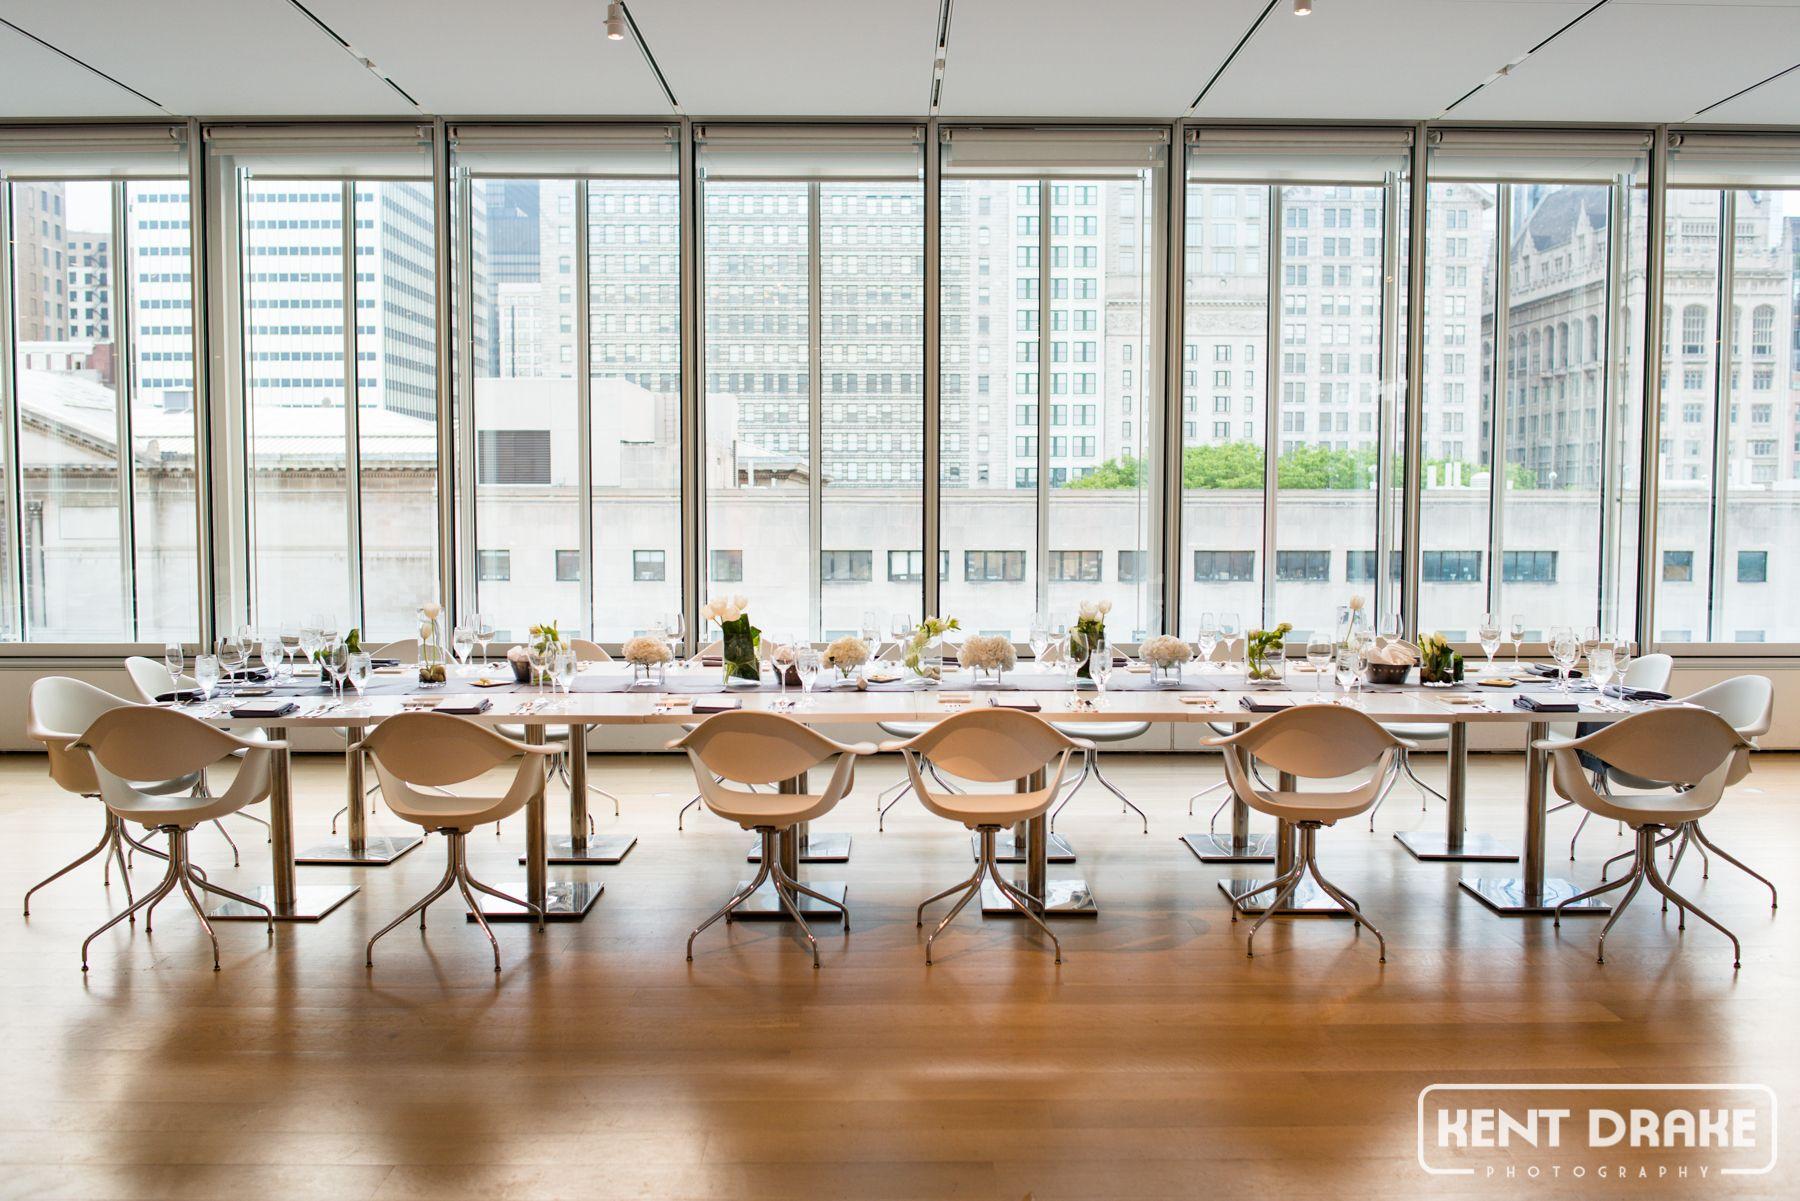 Venue Al Art Insute Of Chicago